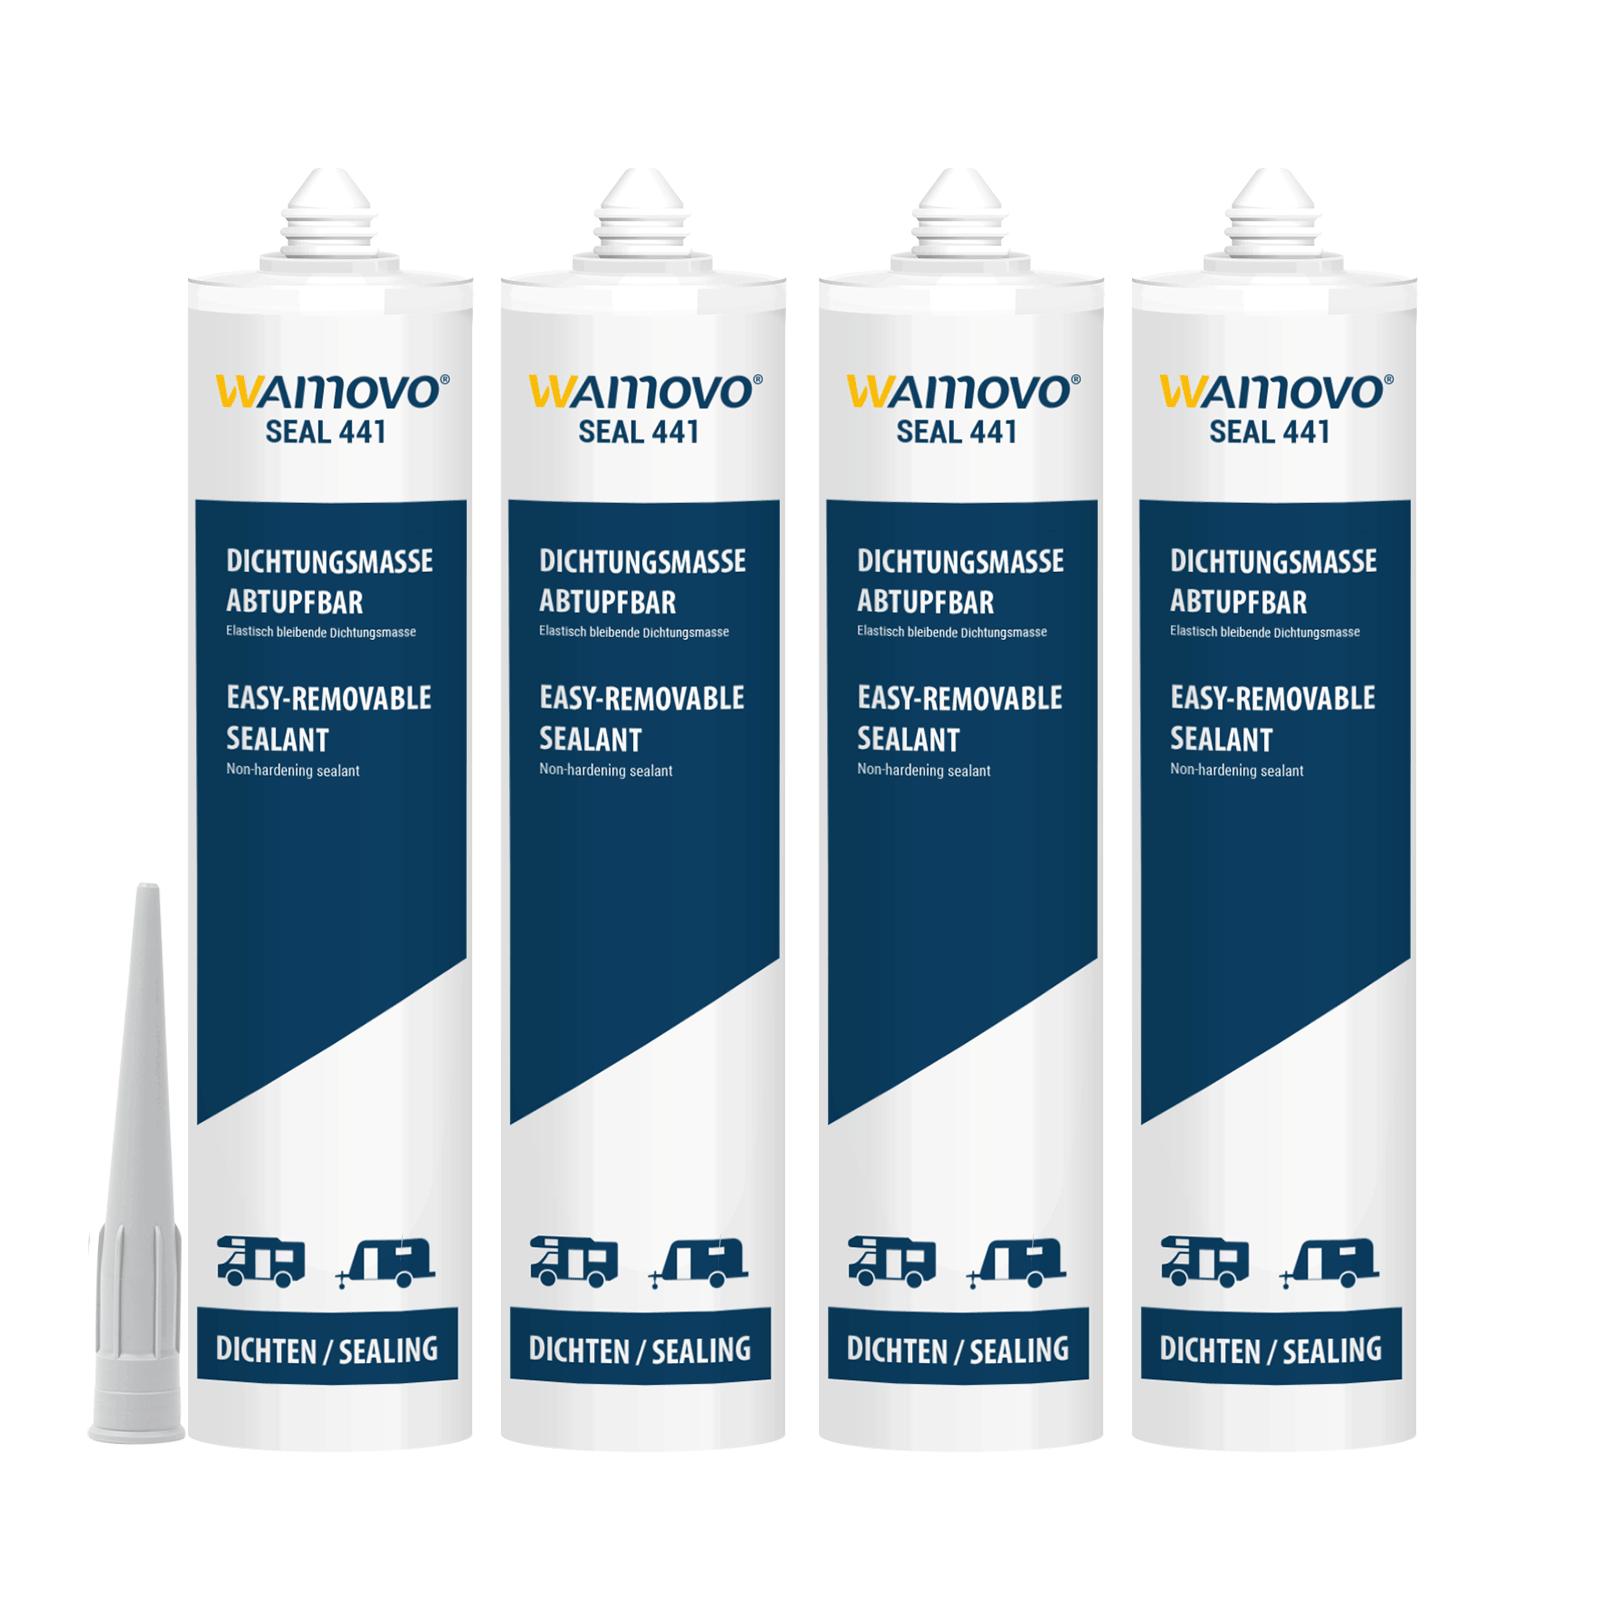 wamovo  Dichtstoff SEAL441 | 1240 ml | abtupfbar | Grau| Dichtmasse